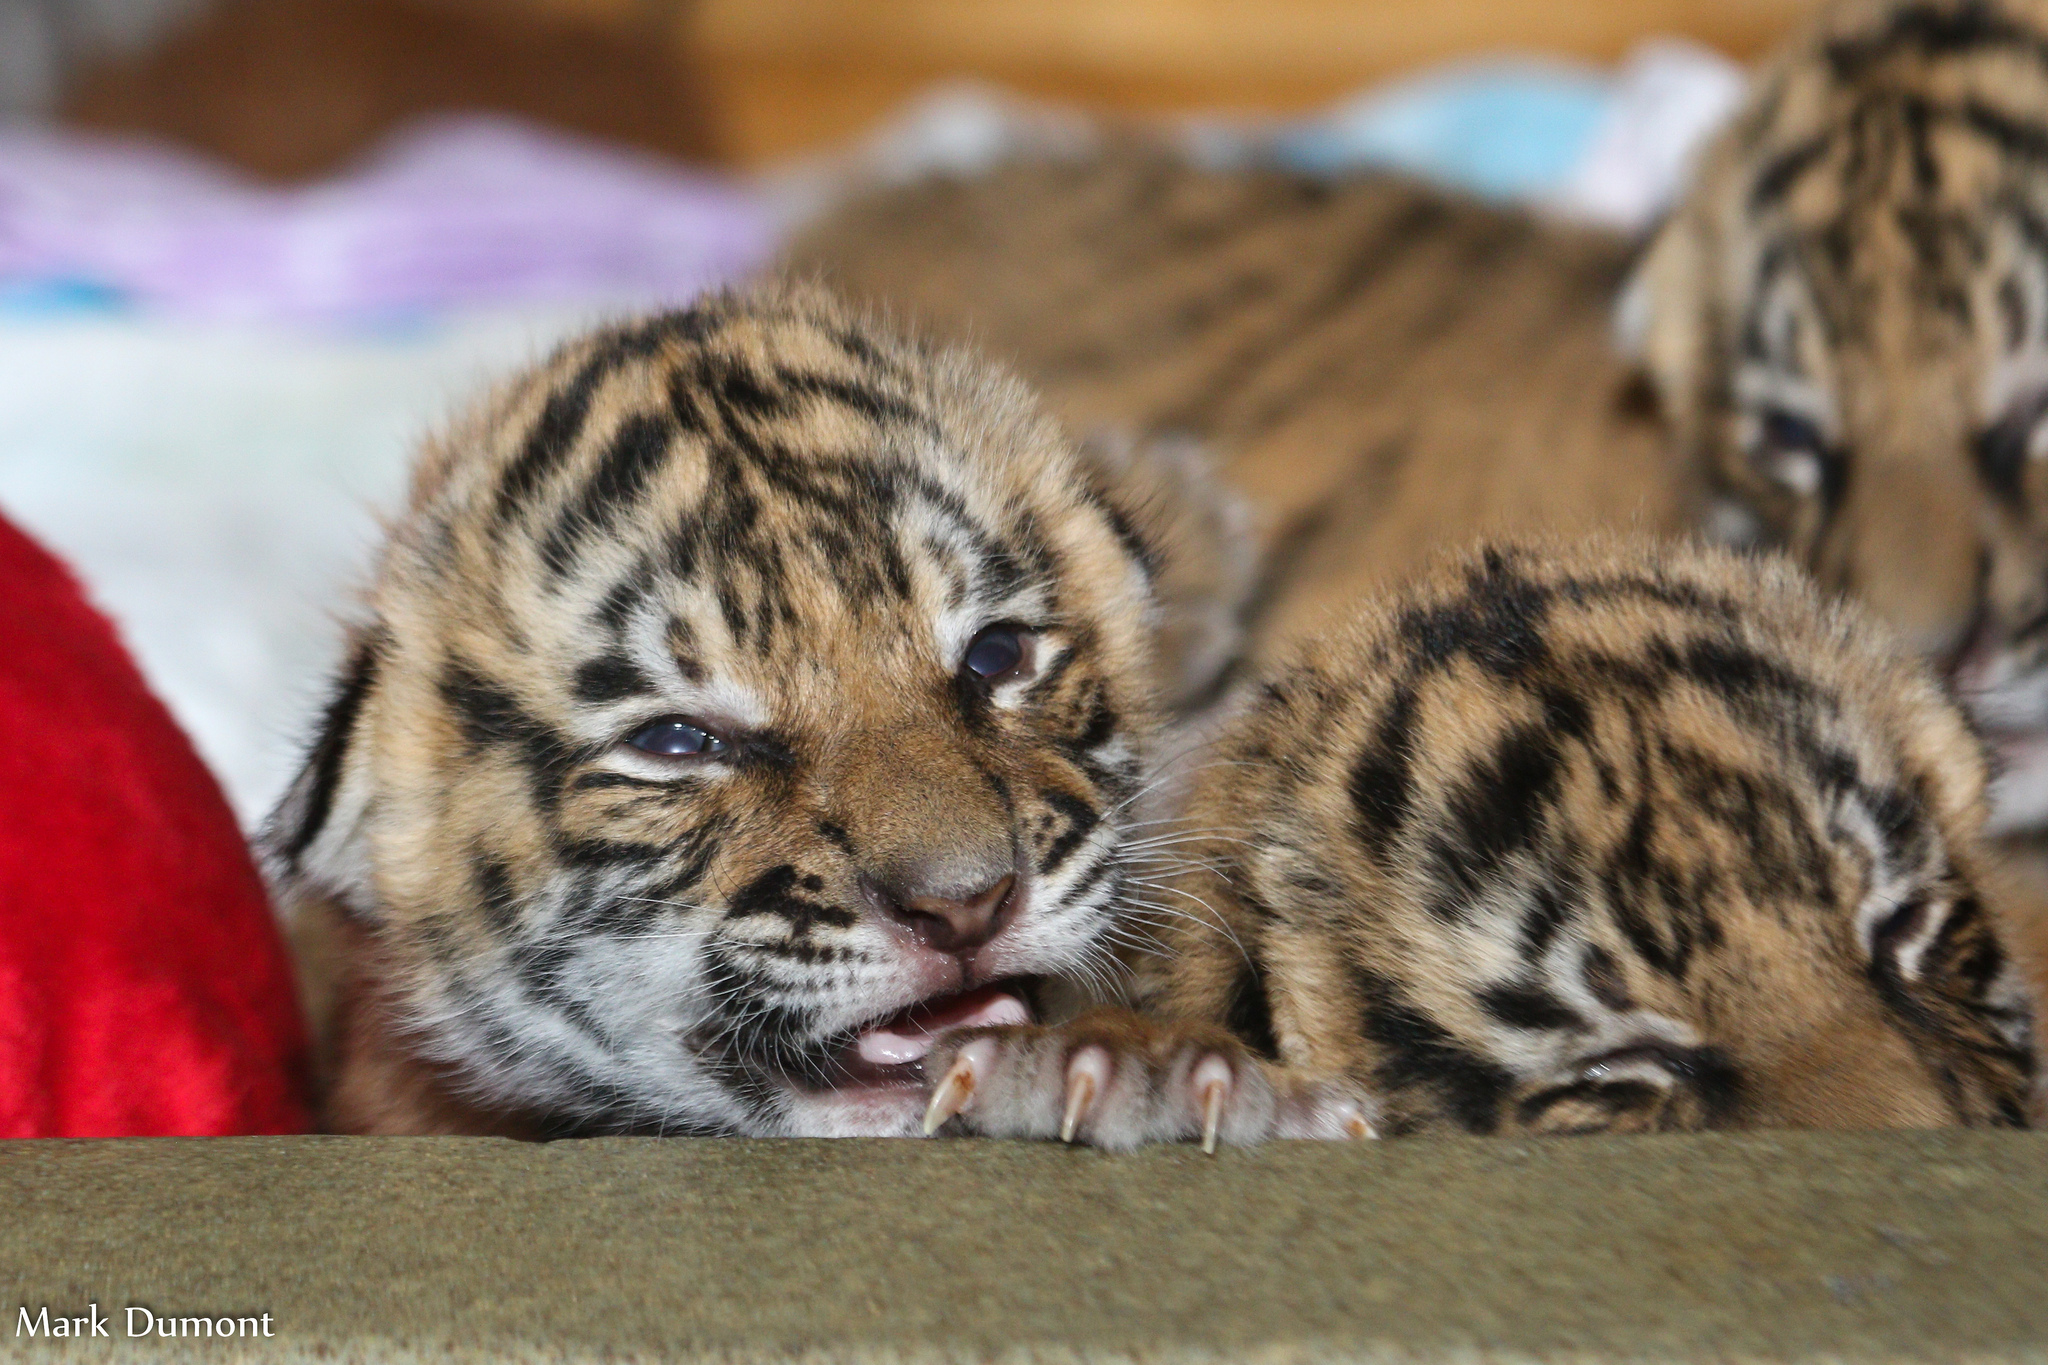 Cincinnati Zoo Tiger Cubs Grrrrowing up Fast - The Cincinnati Zoo ...